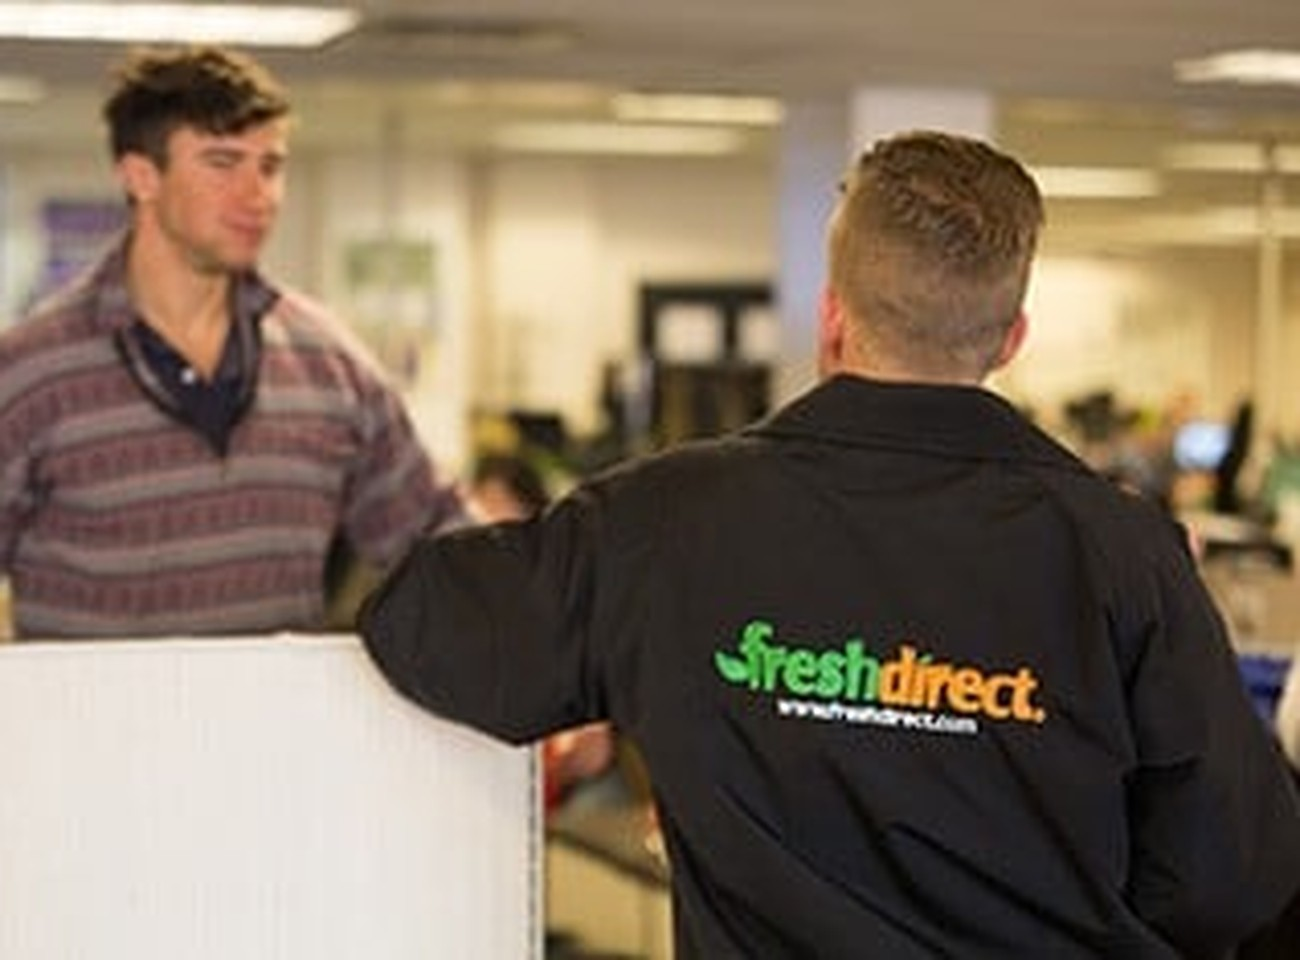 FreshDirect Careers